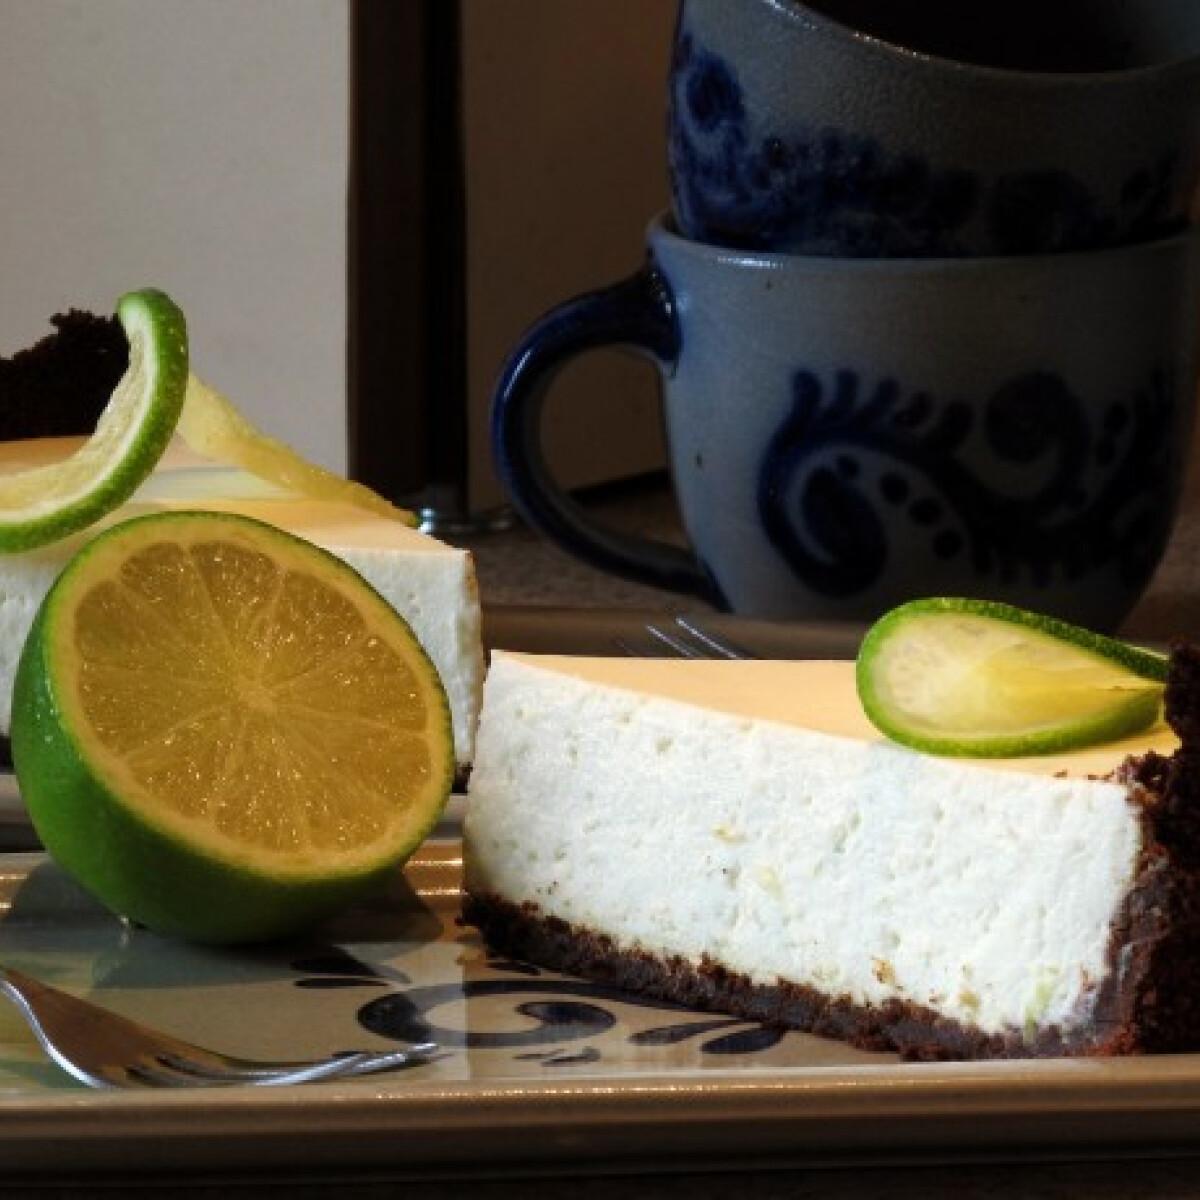 Lime-os cheesecake